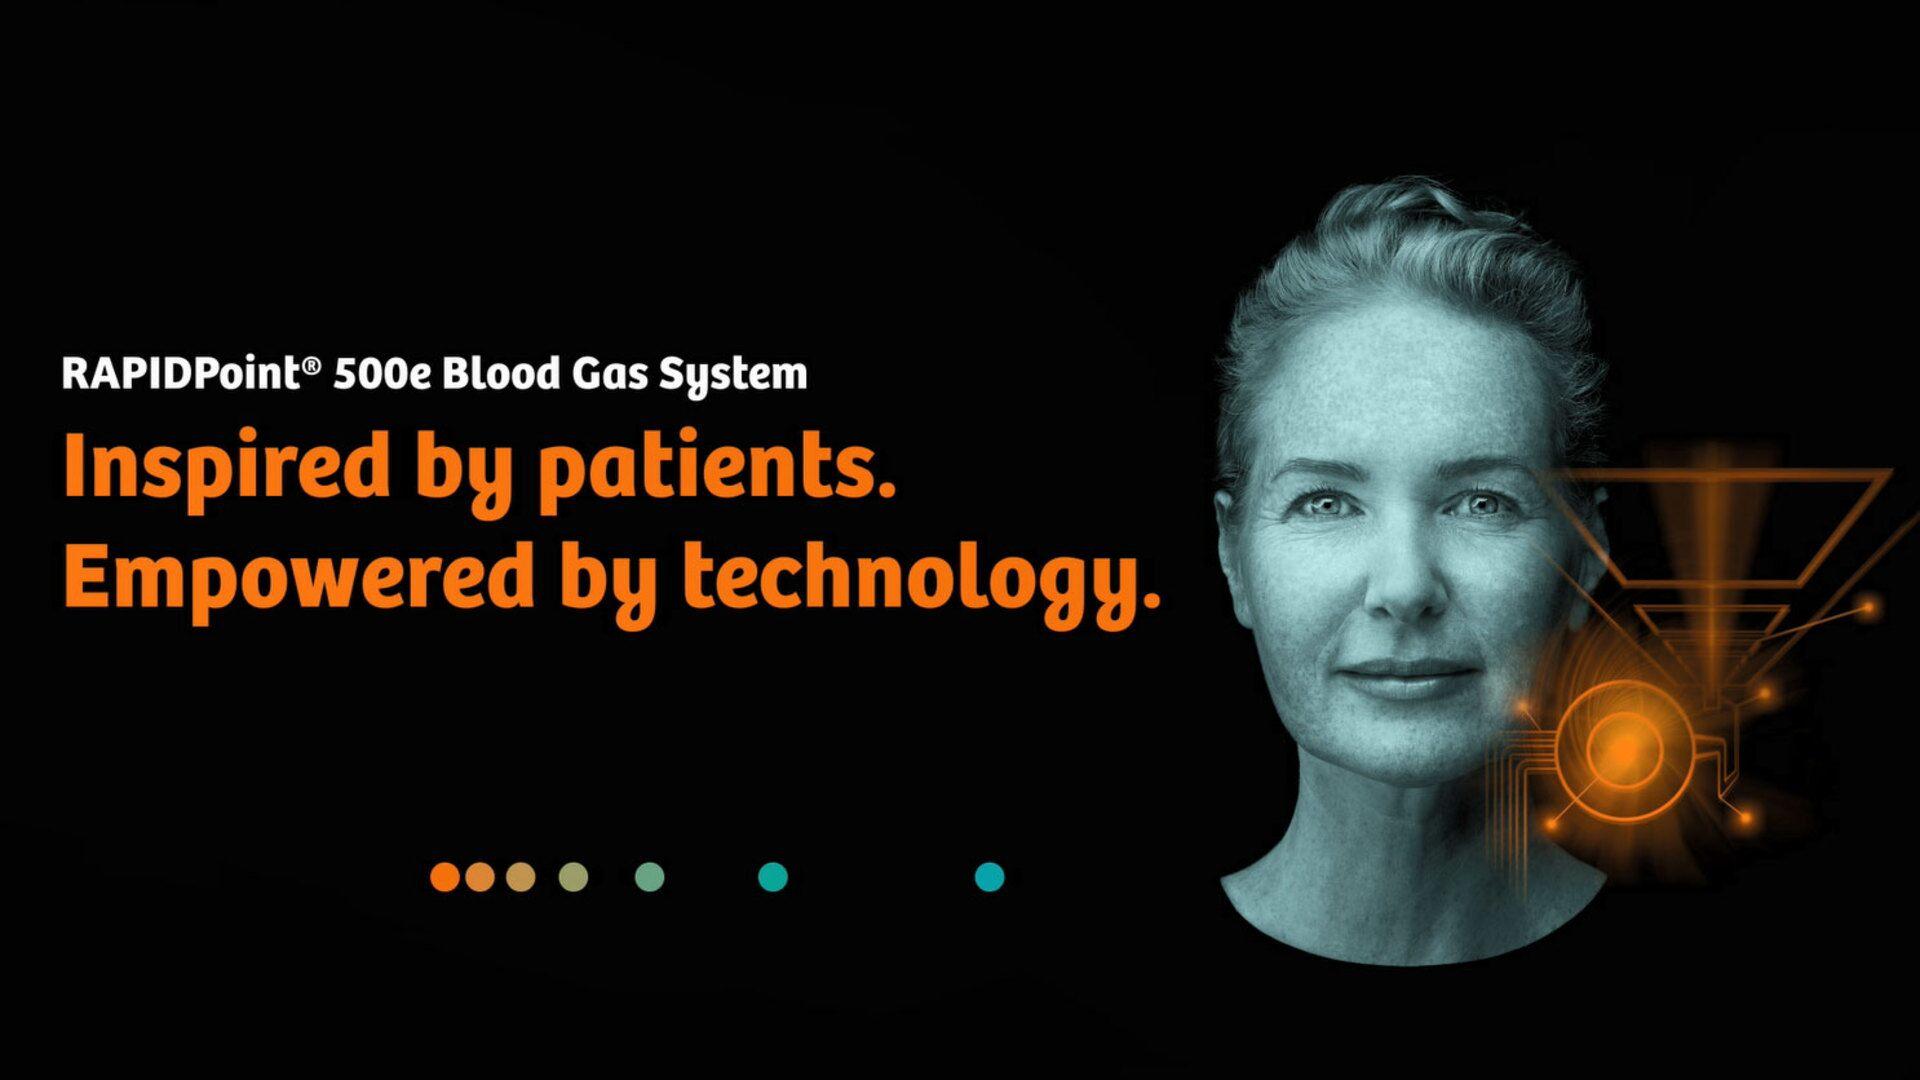 Novo lançamento Siemens Healthineers: RAPIDPoint 500e